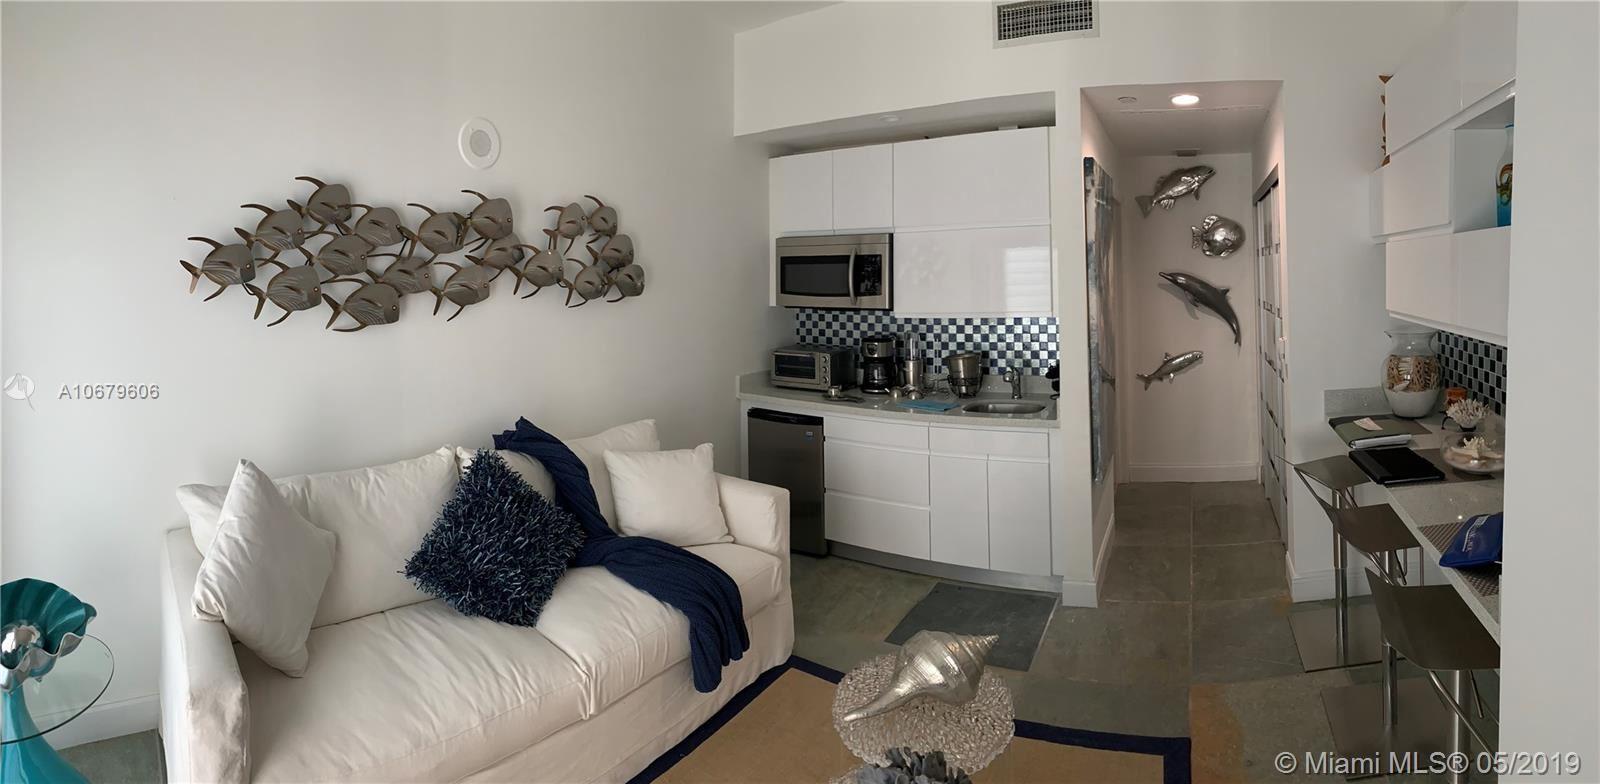 6365 Collins Ave #CAB3, Miami Beach, FL 33141 - #: A10679606